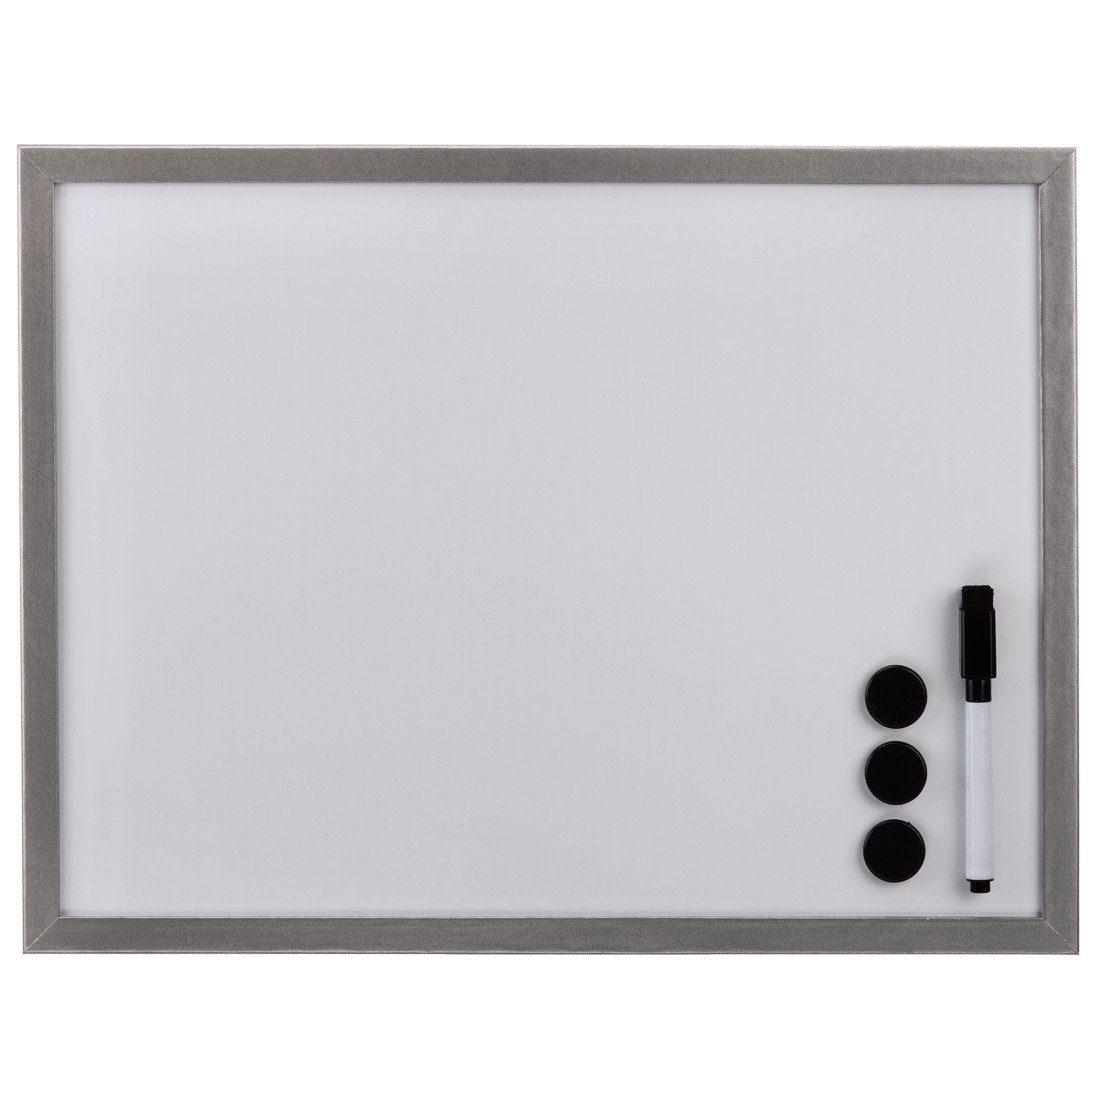 Hama Whiteboard, 60 x 80 cm, Holz, Silber